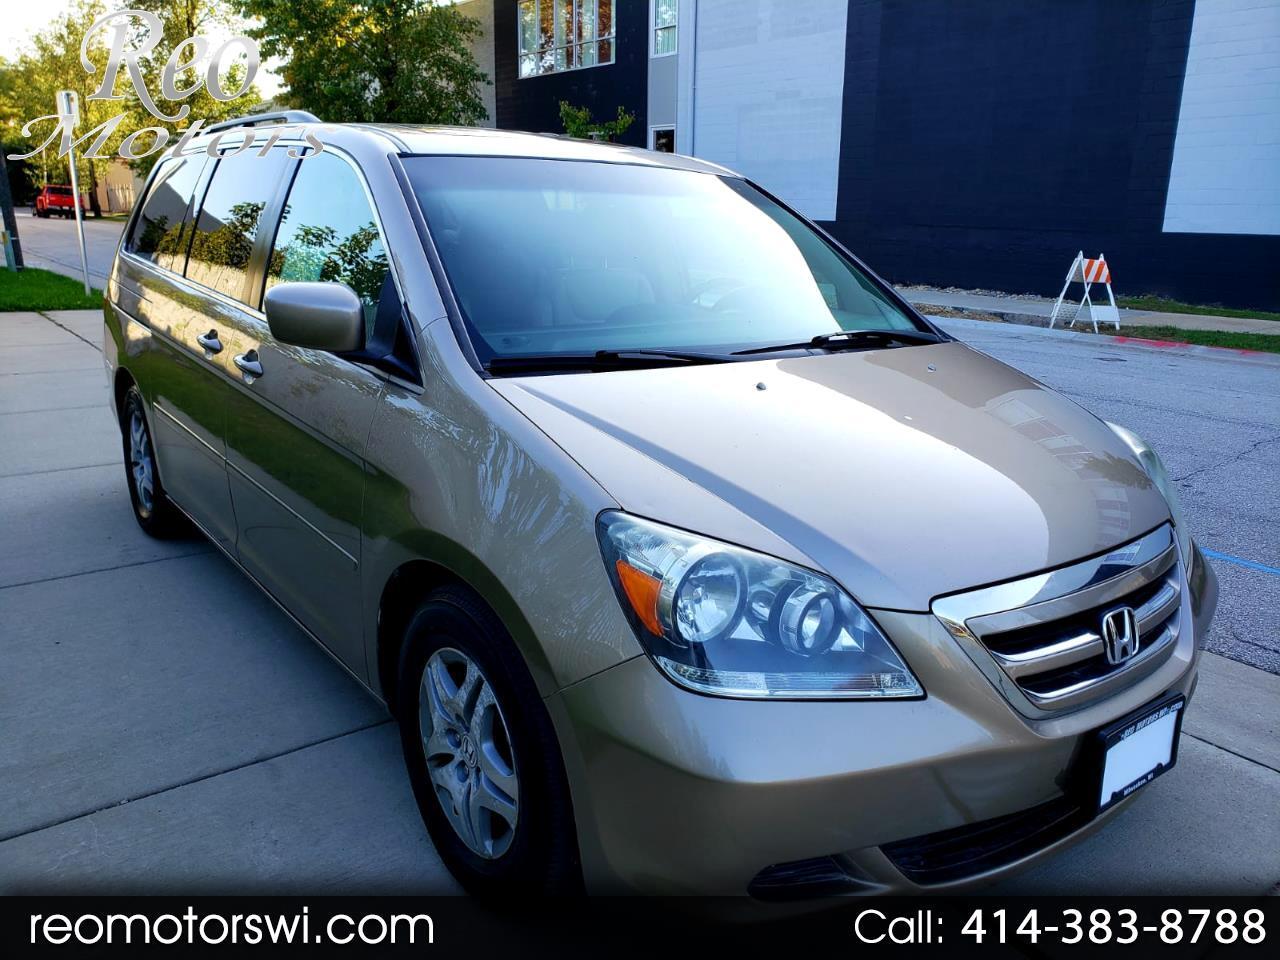 2006 Honda Odyssey FWD